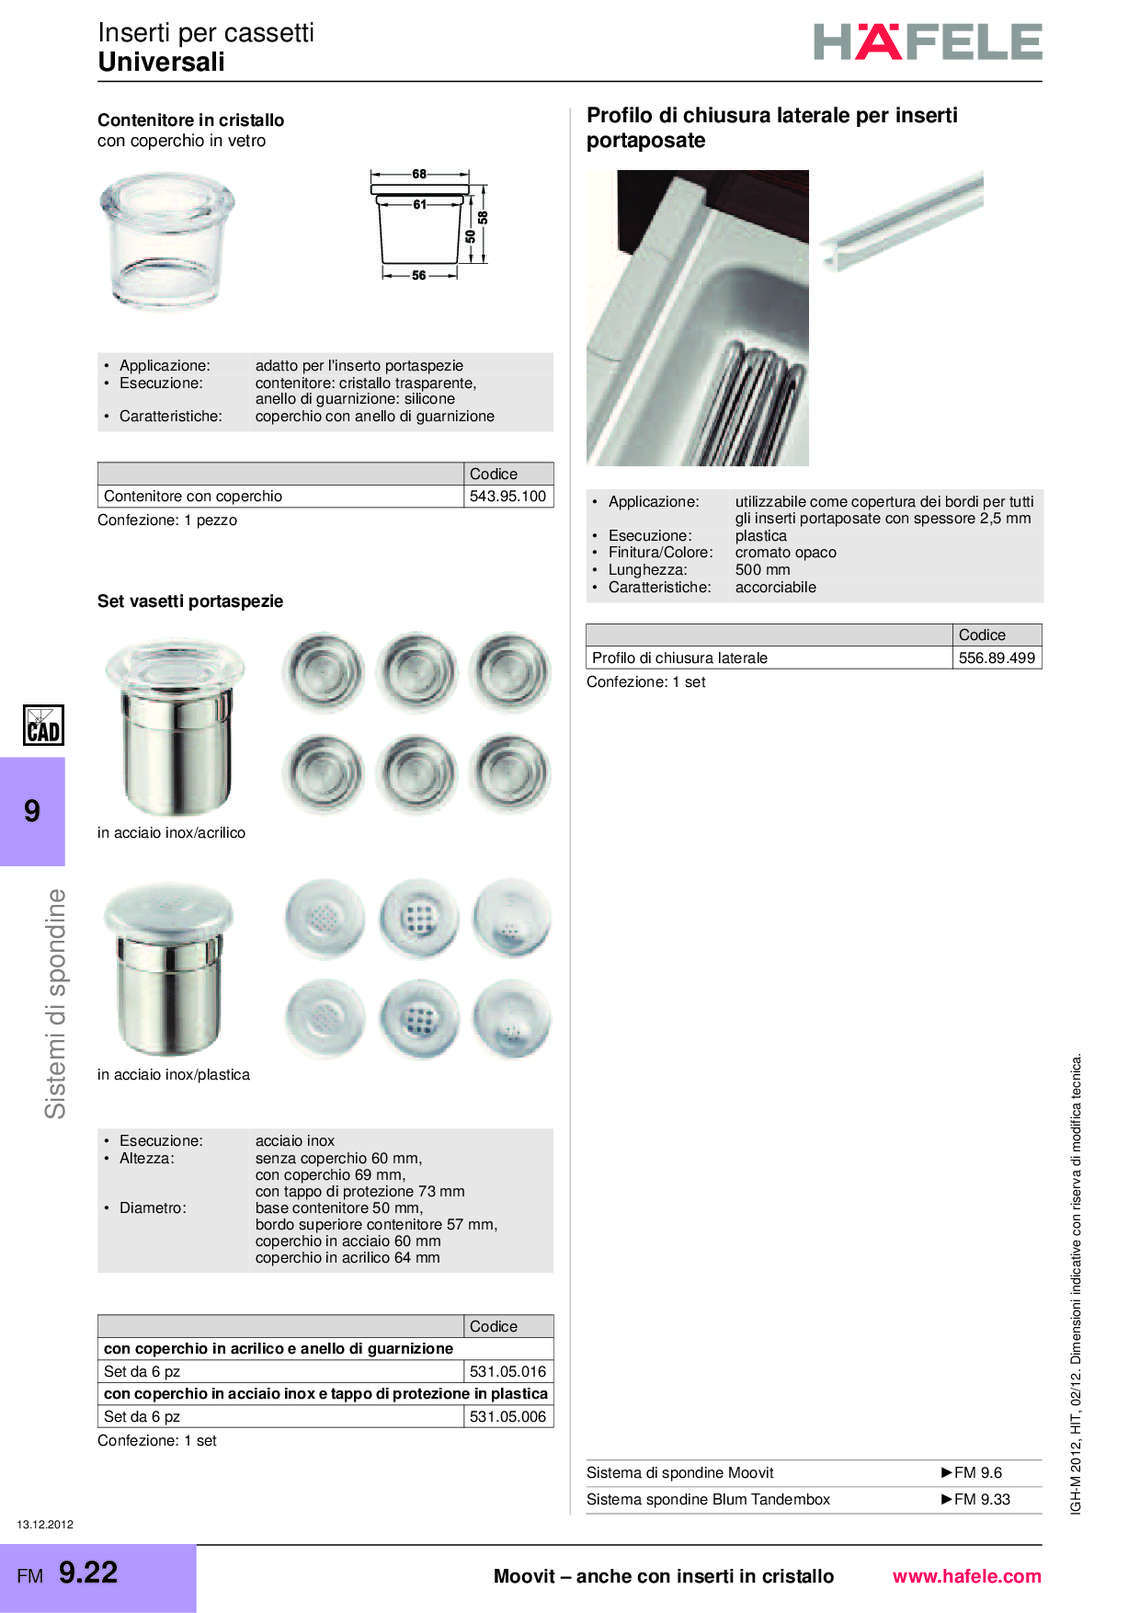 hafele-spondine-e-guide-per-mobili_40_035.jpg